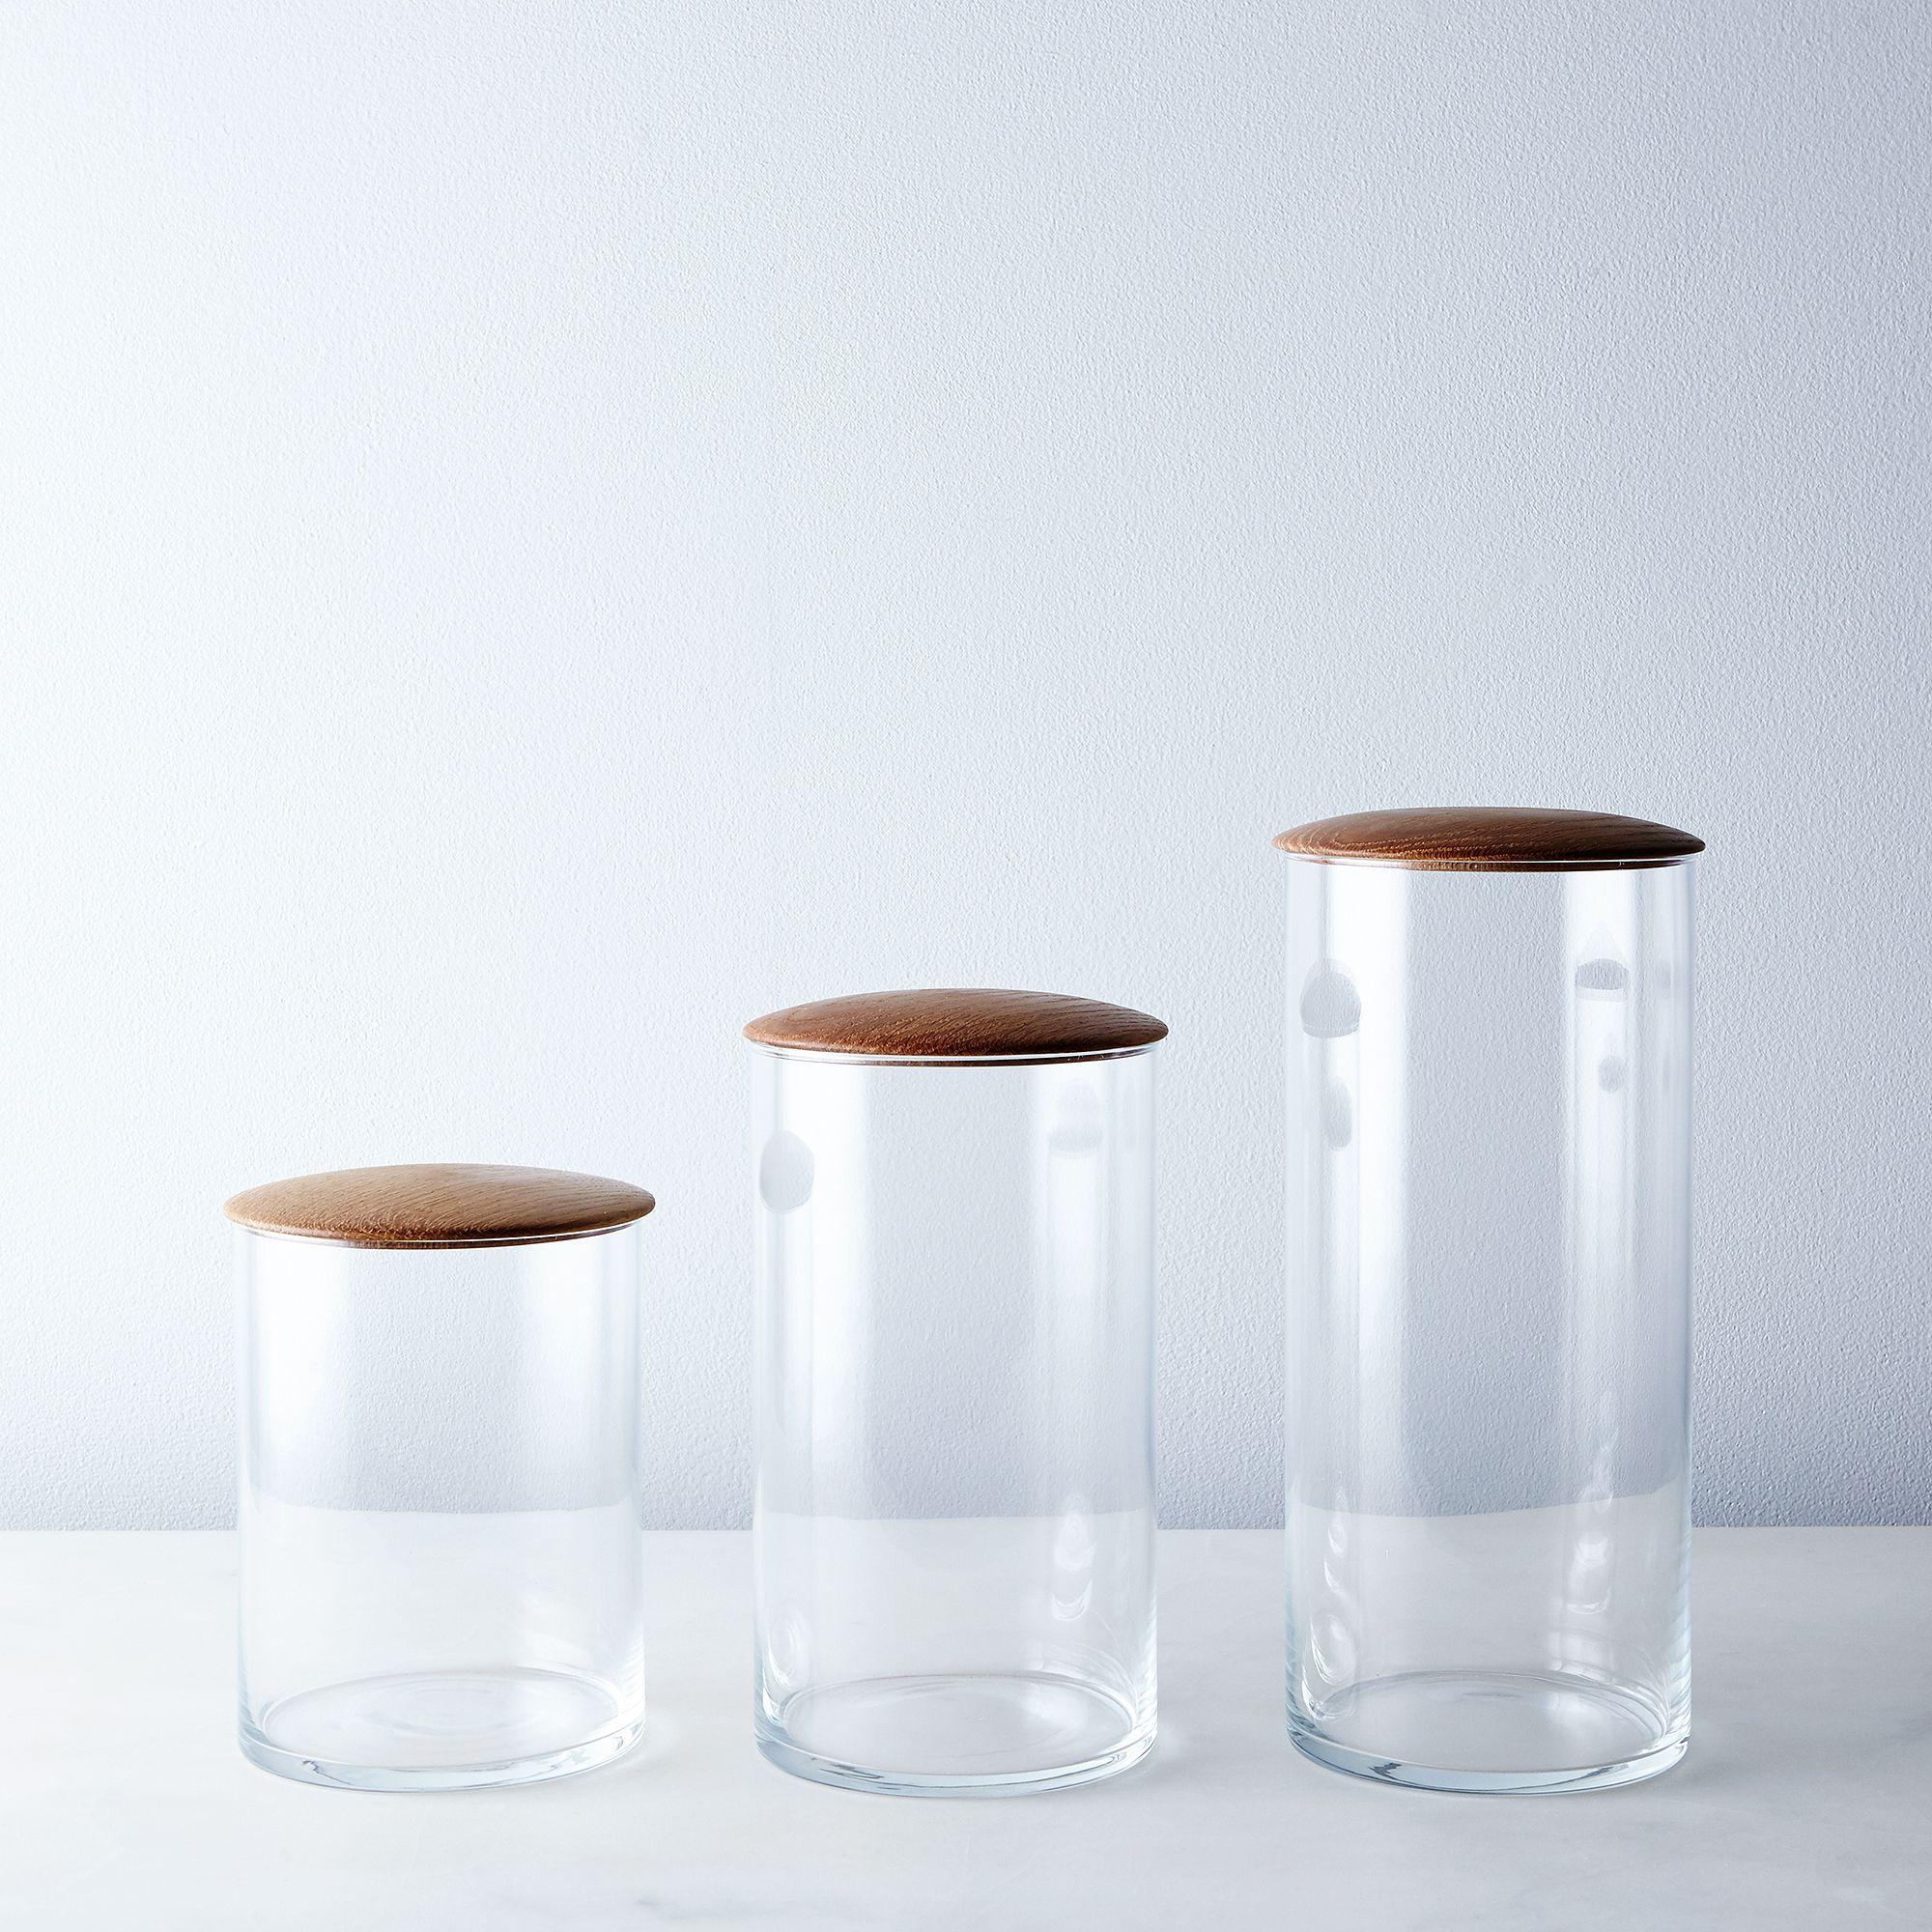 C8d6ddb6 a0f8 11e5 a190 0ef7535729df  2015 0712 hawkins ny glass and oak simple storage container set of 3 silo rocky luten 003